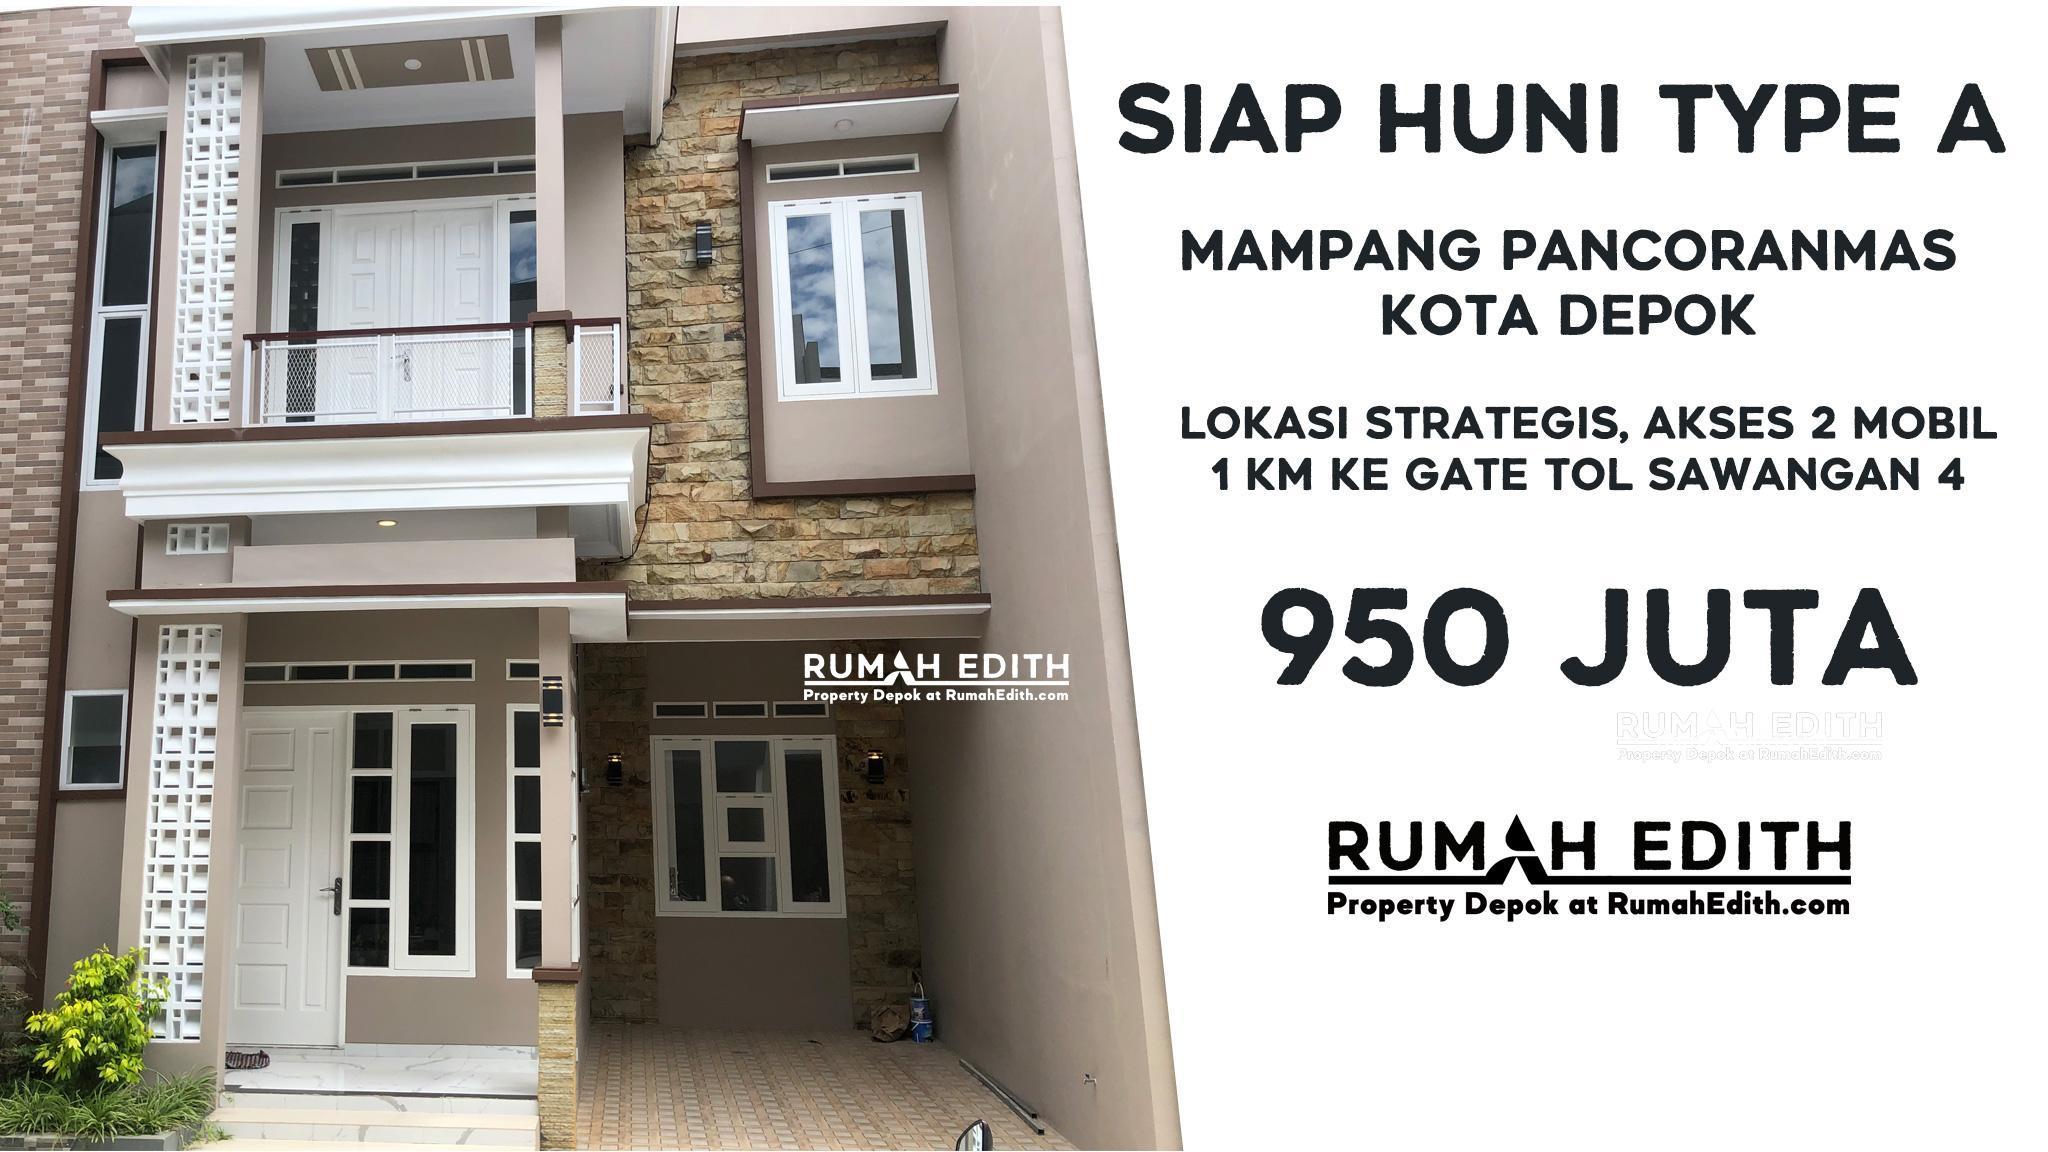 Dijual Rumah di Mampang Depok, 2 lantai dalam mini cluster 950 juta – Siap Huni